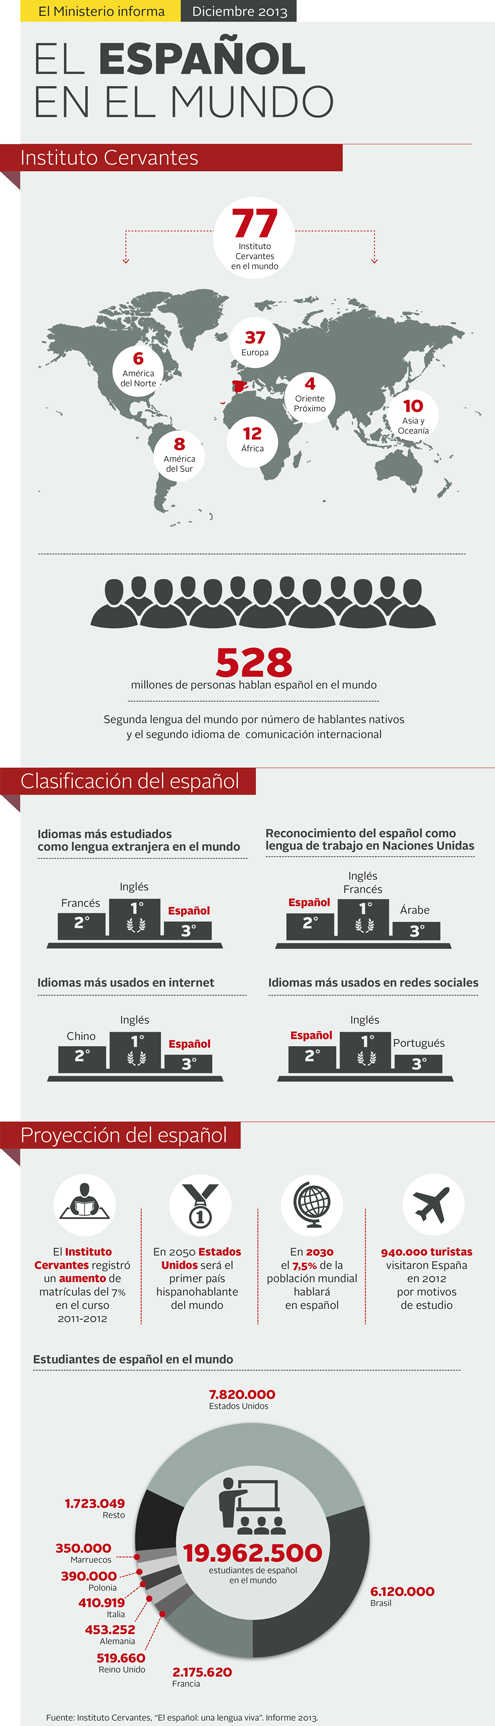 infografia_el_espanol_en_el_mundo